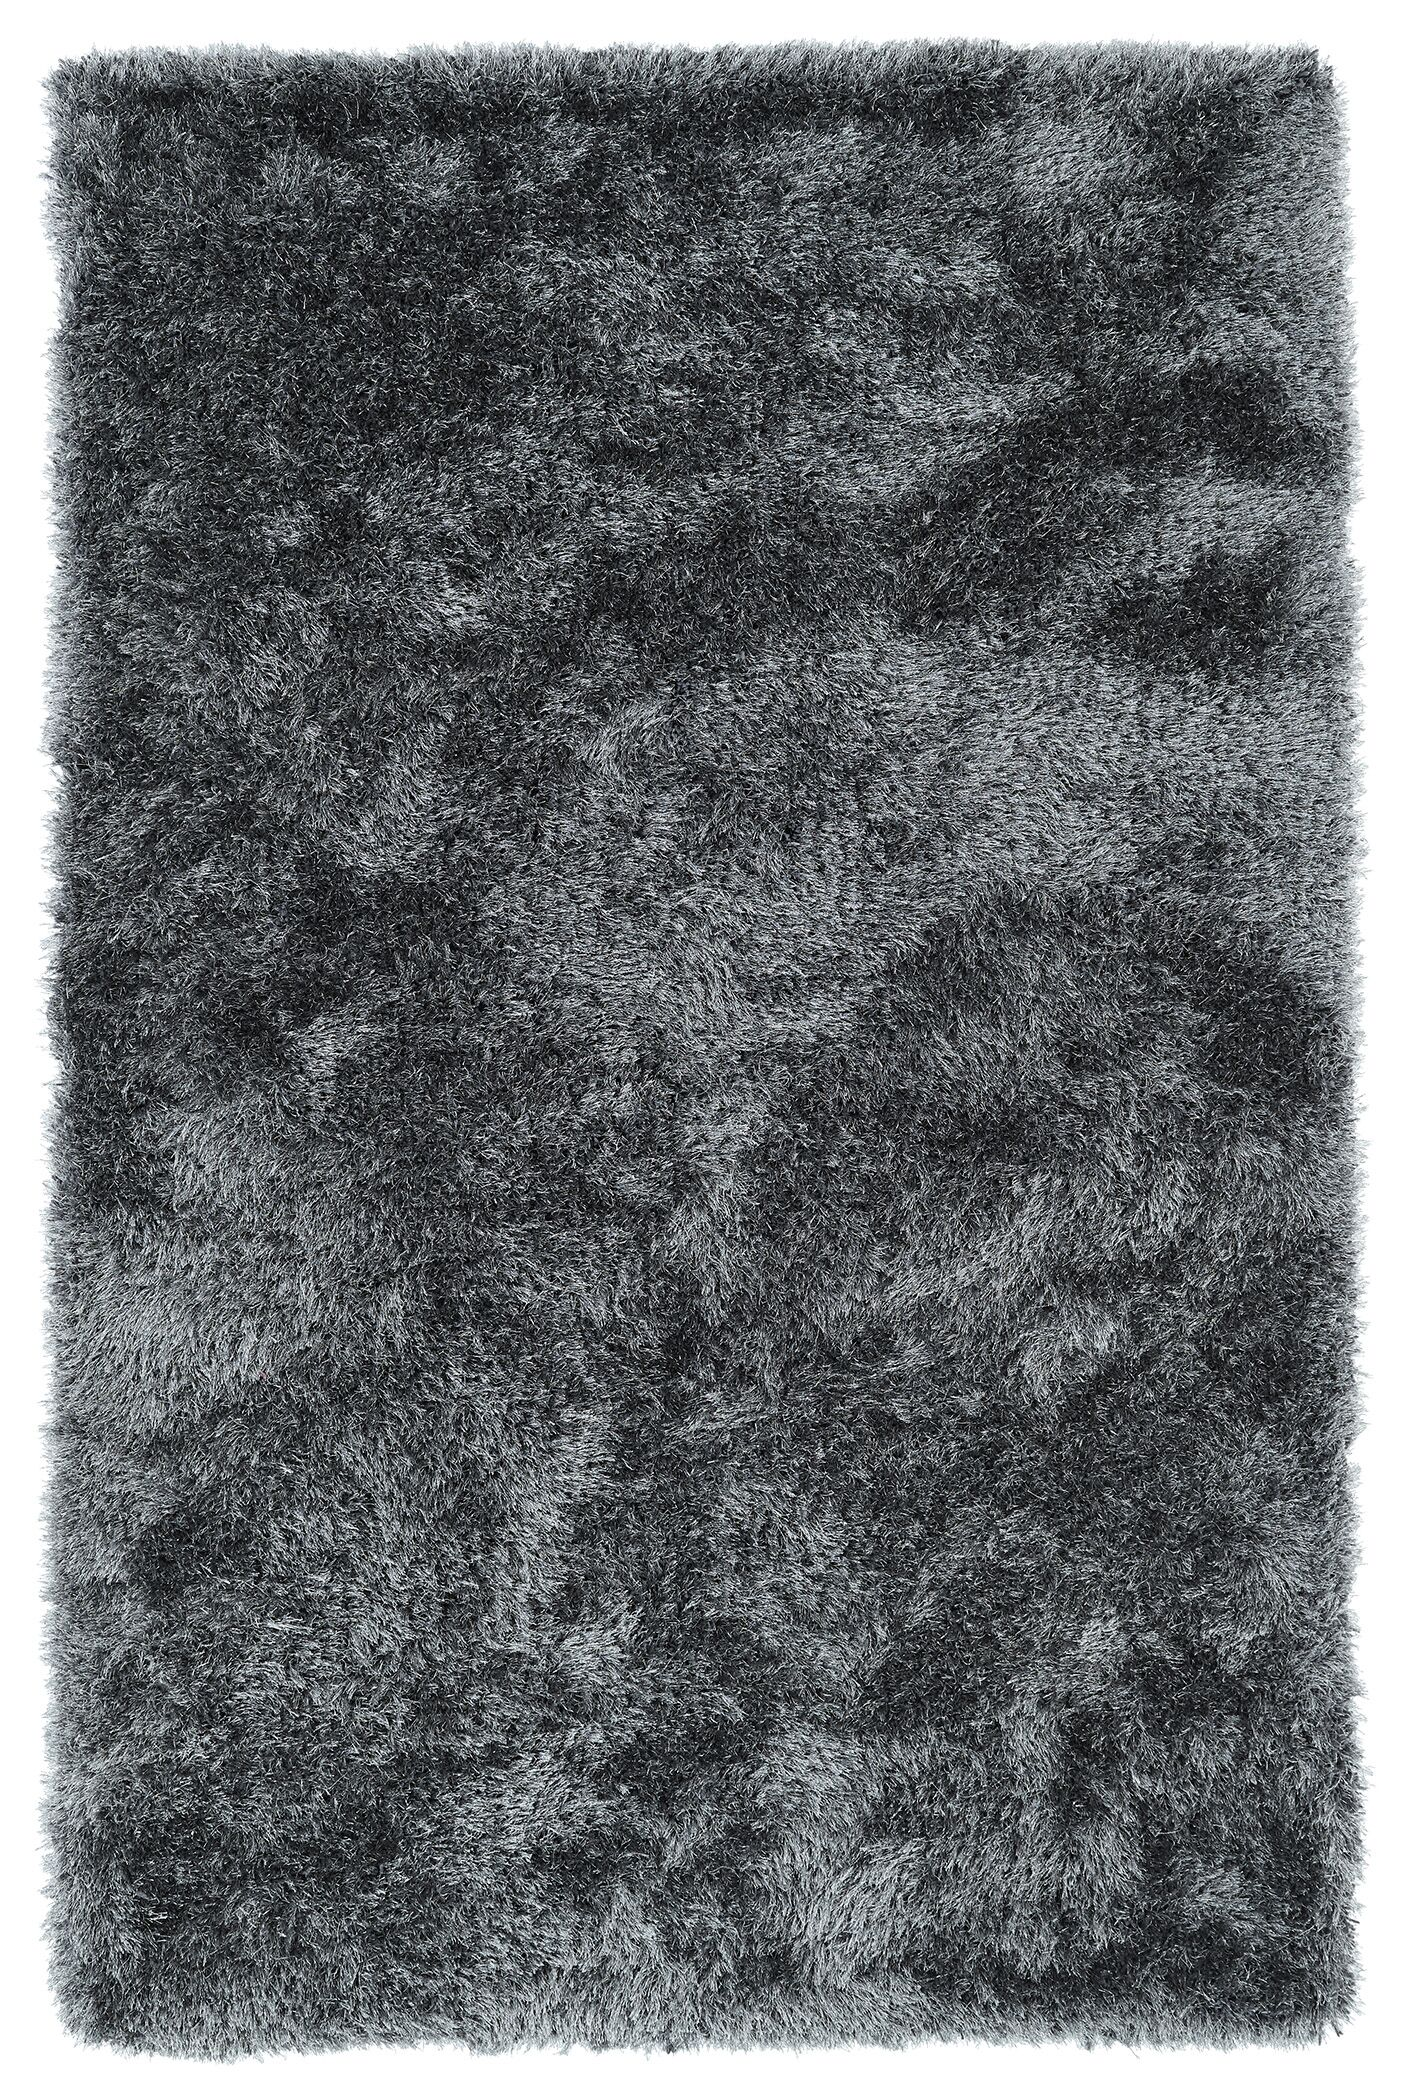 Caine Grey Area Rug Rug Size: Rectangle 9' x 12'